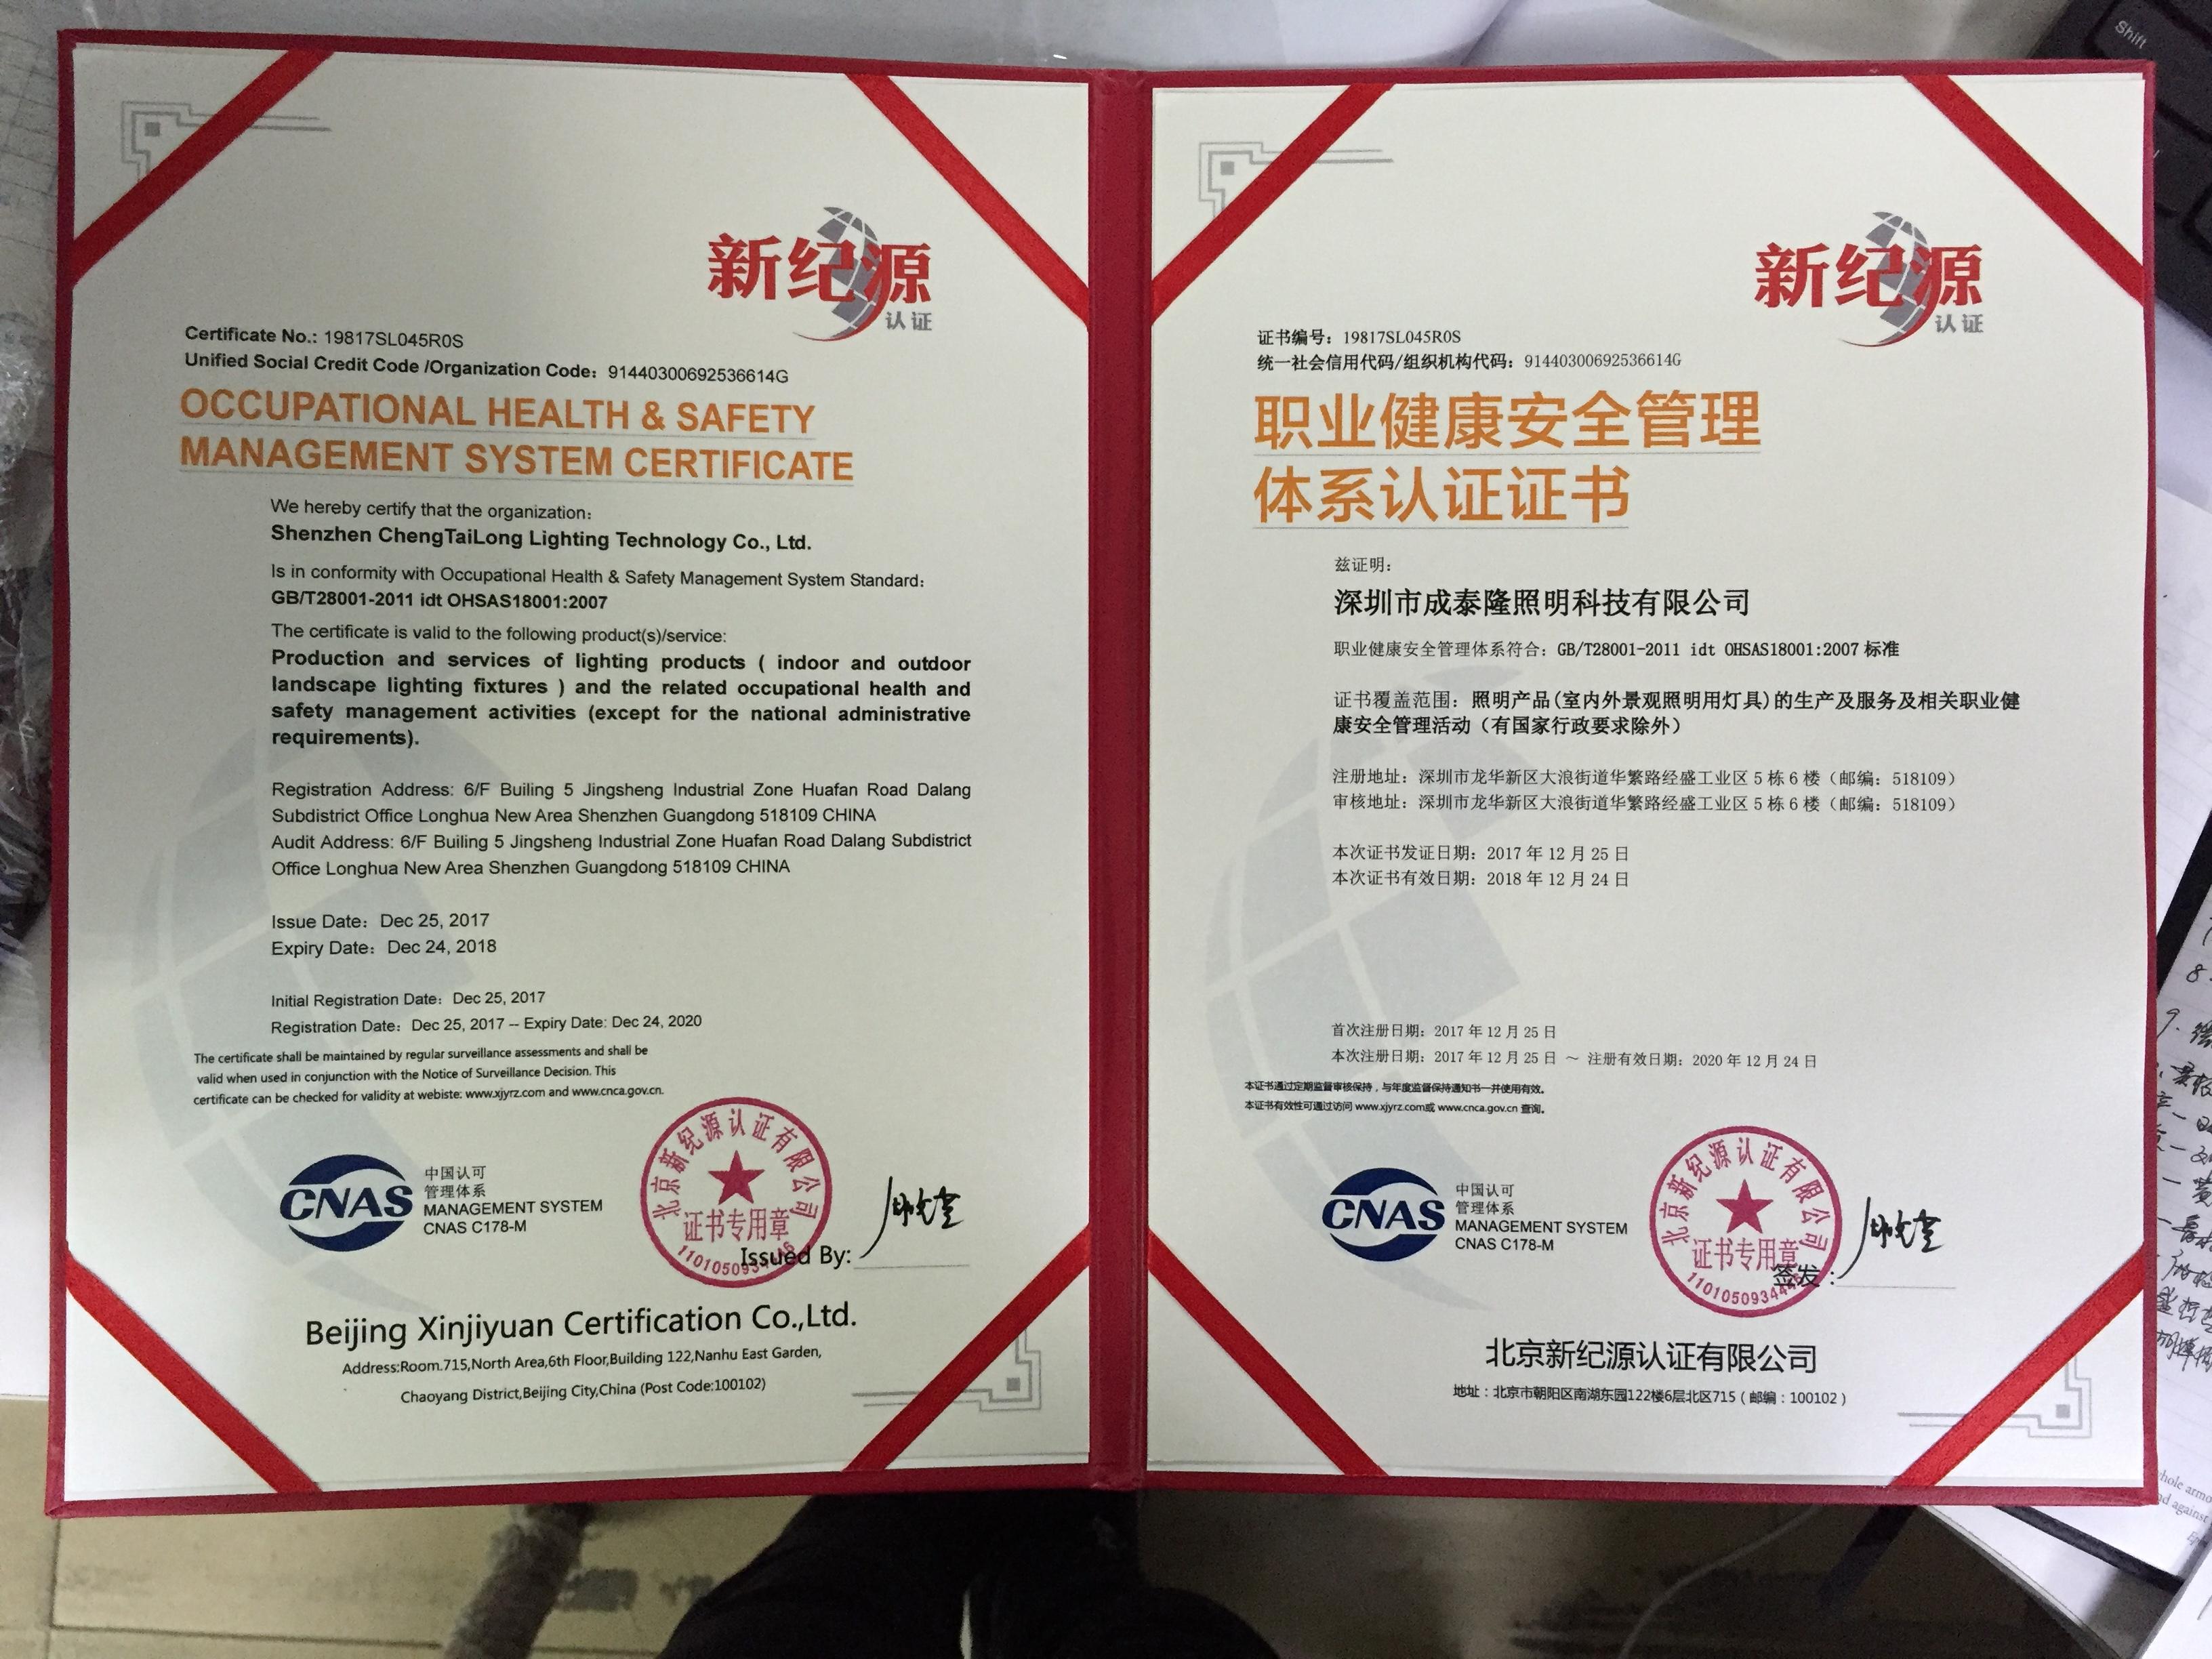 Product Certification Shenzhen Ctl Lighting Technology Coltd